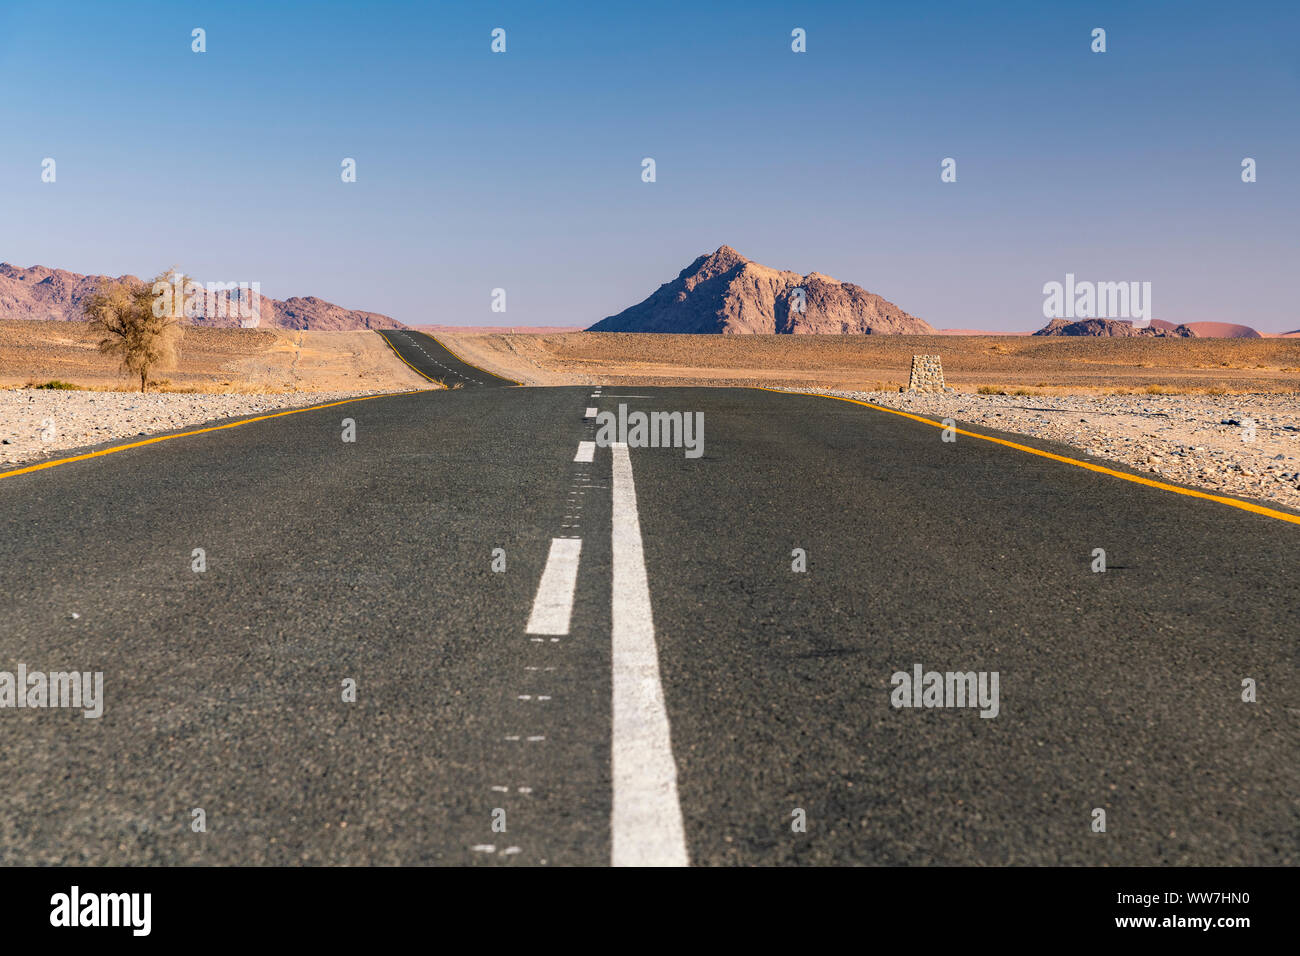 Paved road, Namib-Naukluft National Park, Sesriem, Namibia Stock Photo